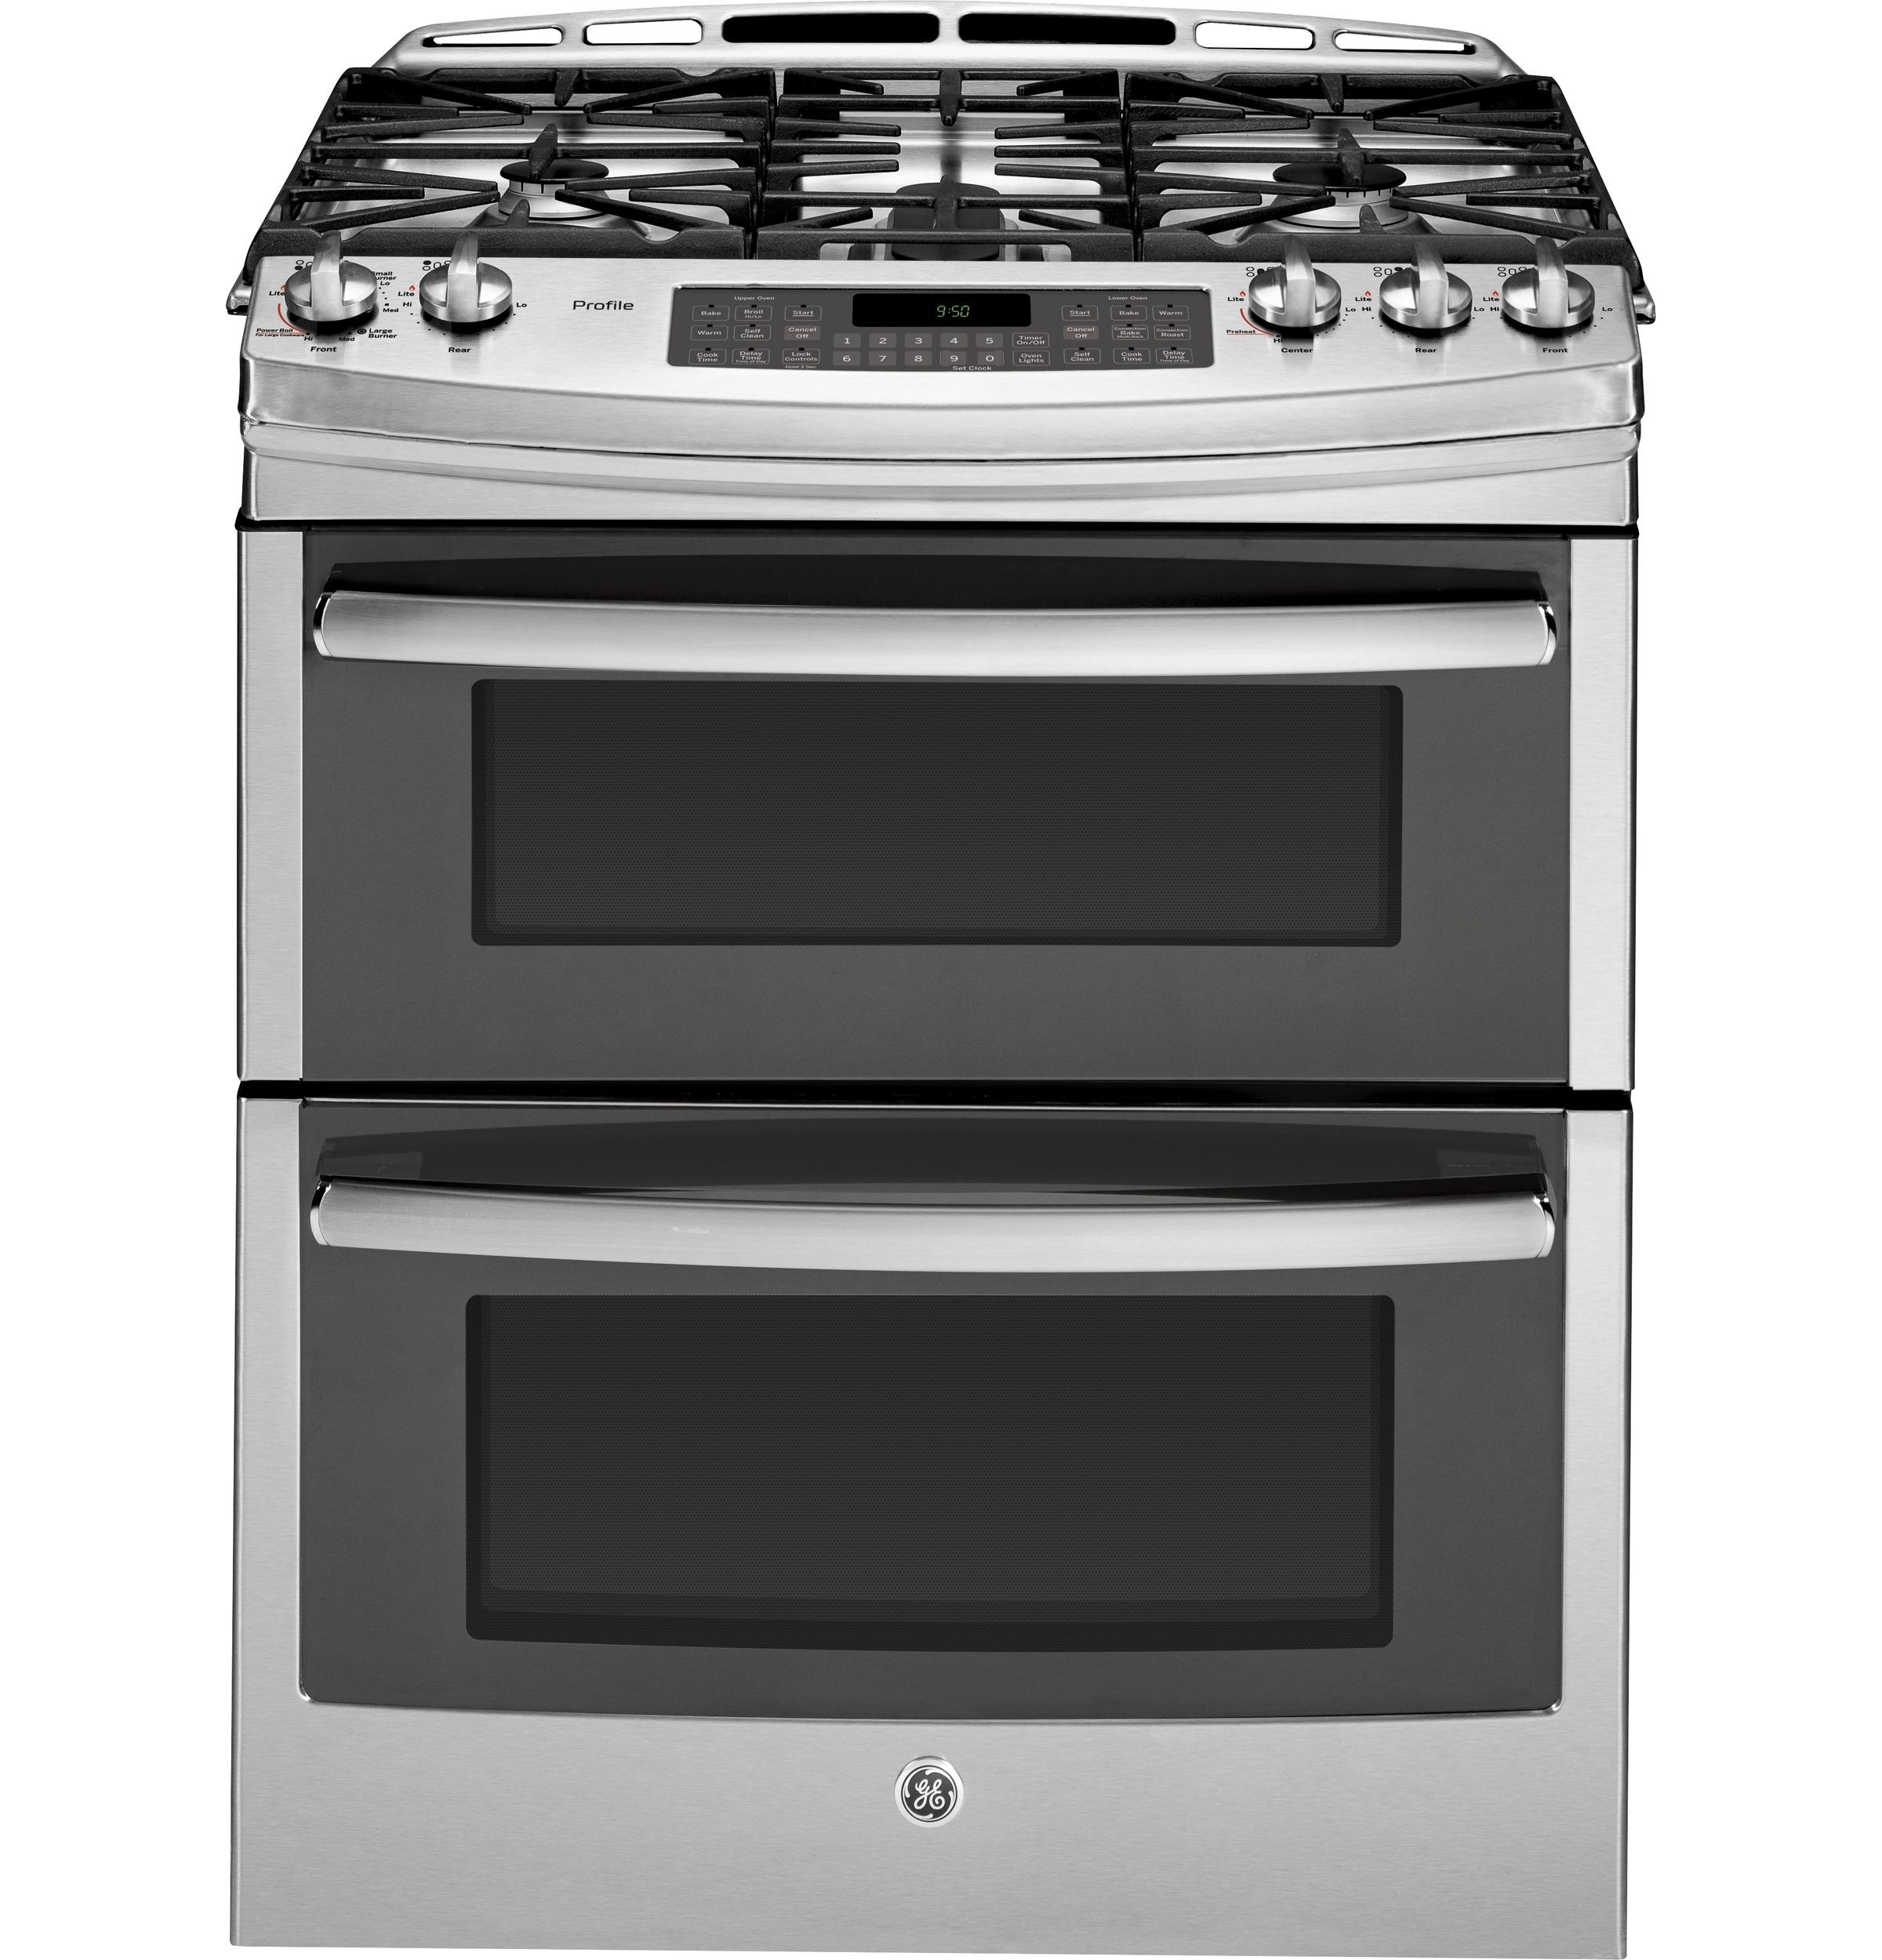 Gas Oven With Slide Under Doorranges from ge appliances